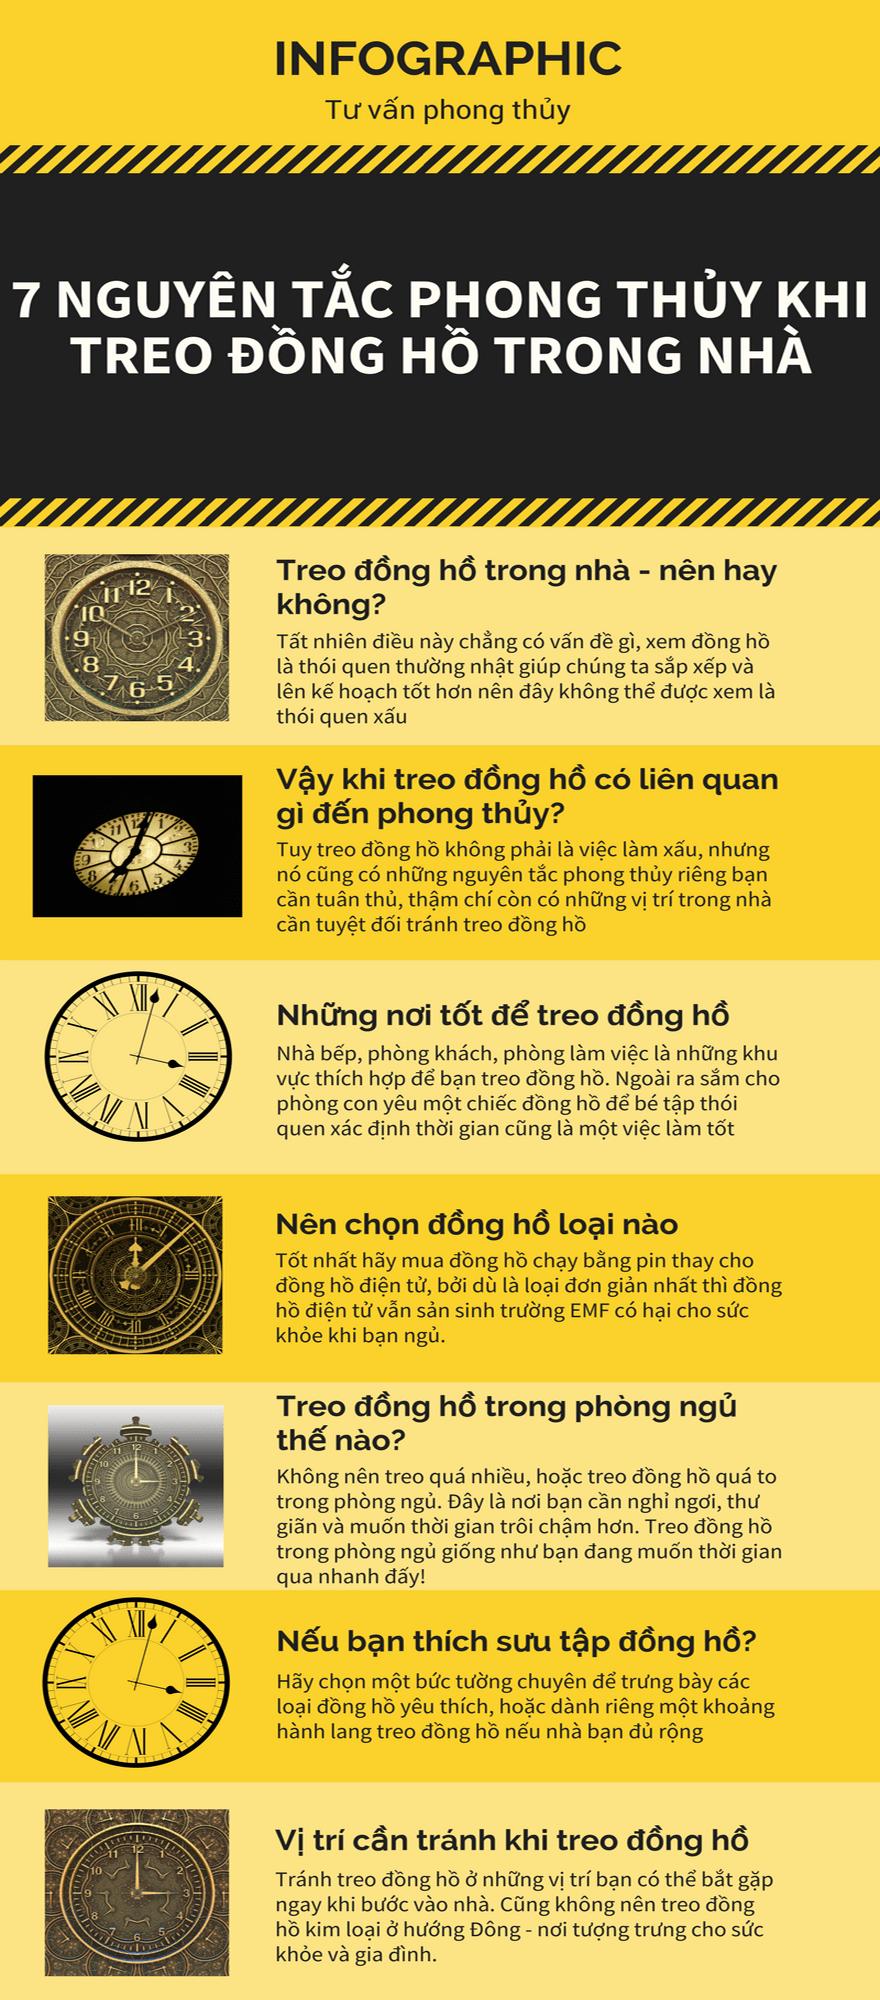 nguyen-tac-phong-thuy-khi-treo-dong-ho